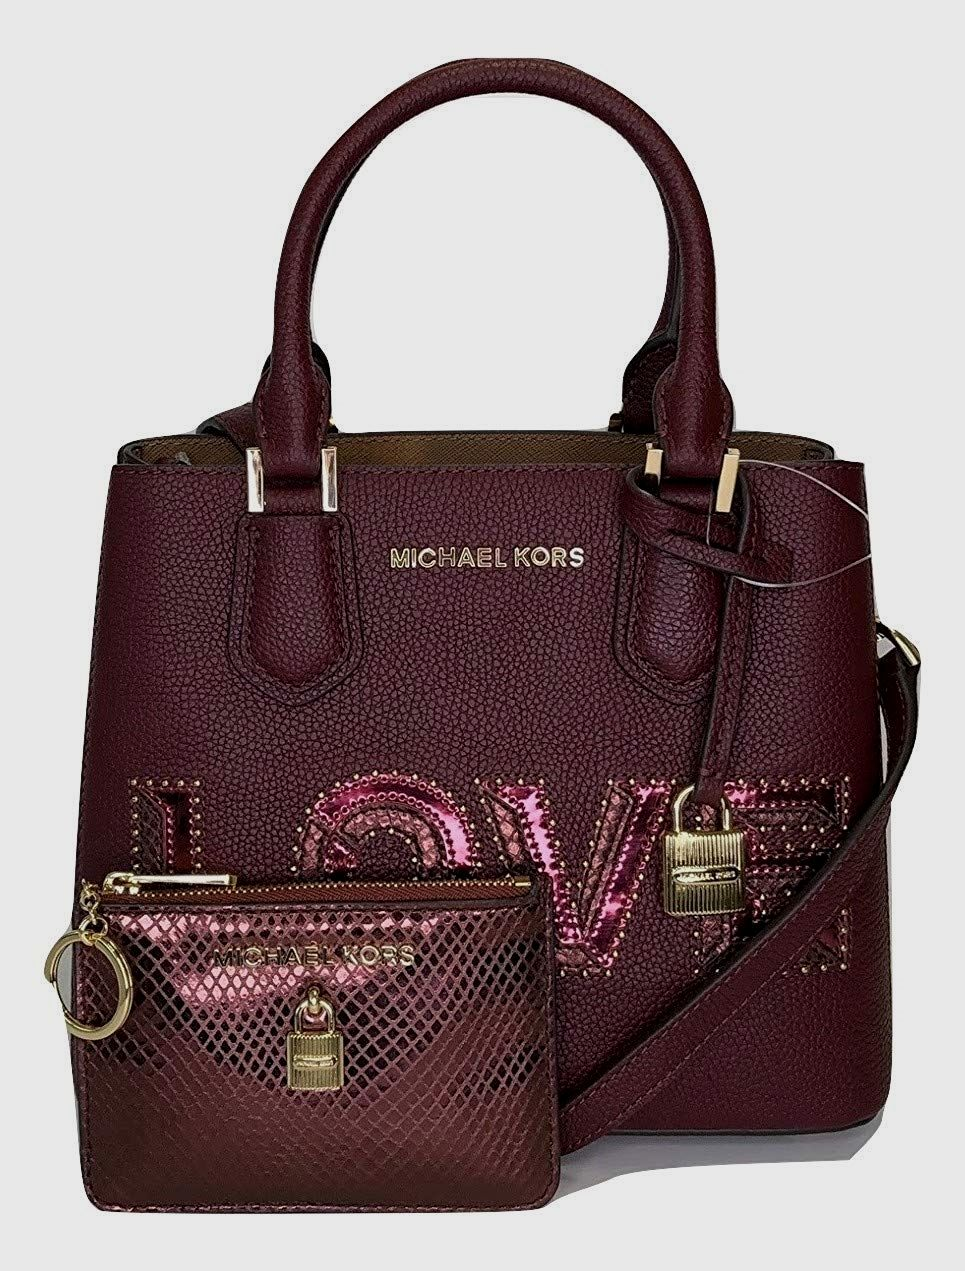 aeaf89eb26bba2 New MICHAEL Michael Kors Sofia MD NS Satchel bundled with Michael Kors SM  Card Case Carryall Wallet Women Bag. [$318.00 - 328.00] allfashi…